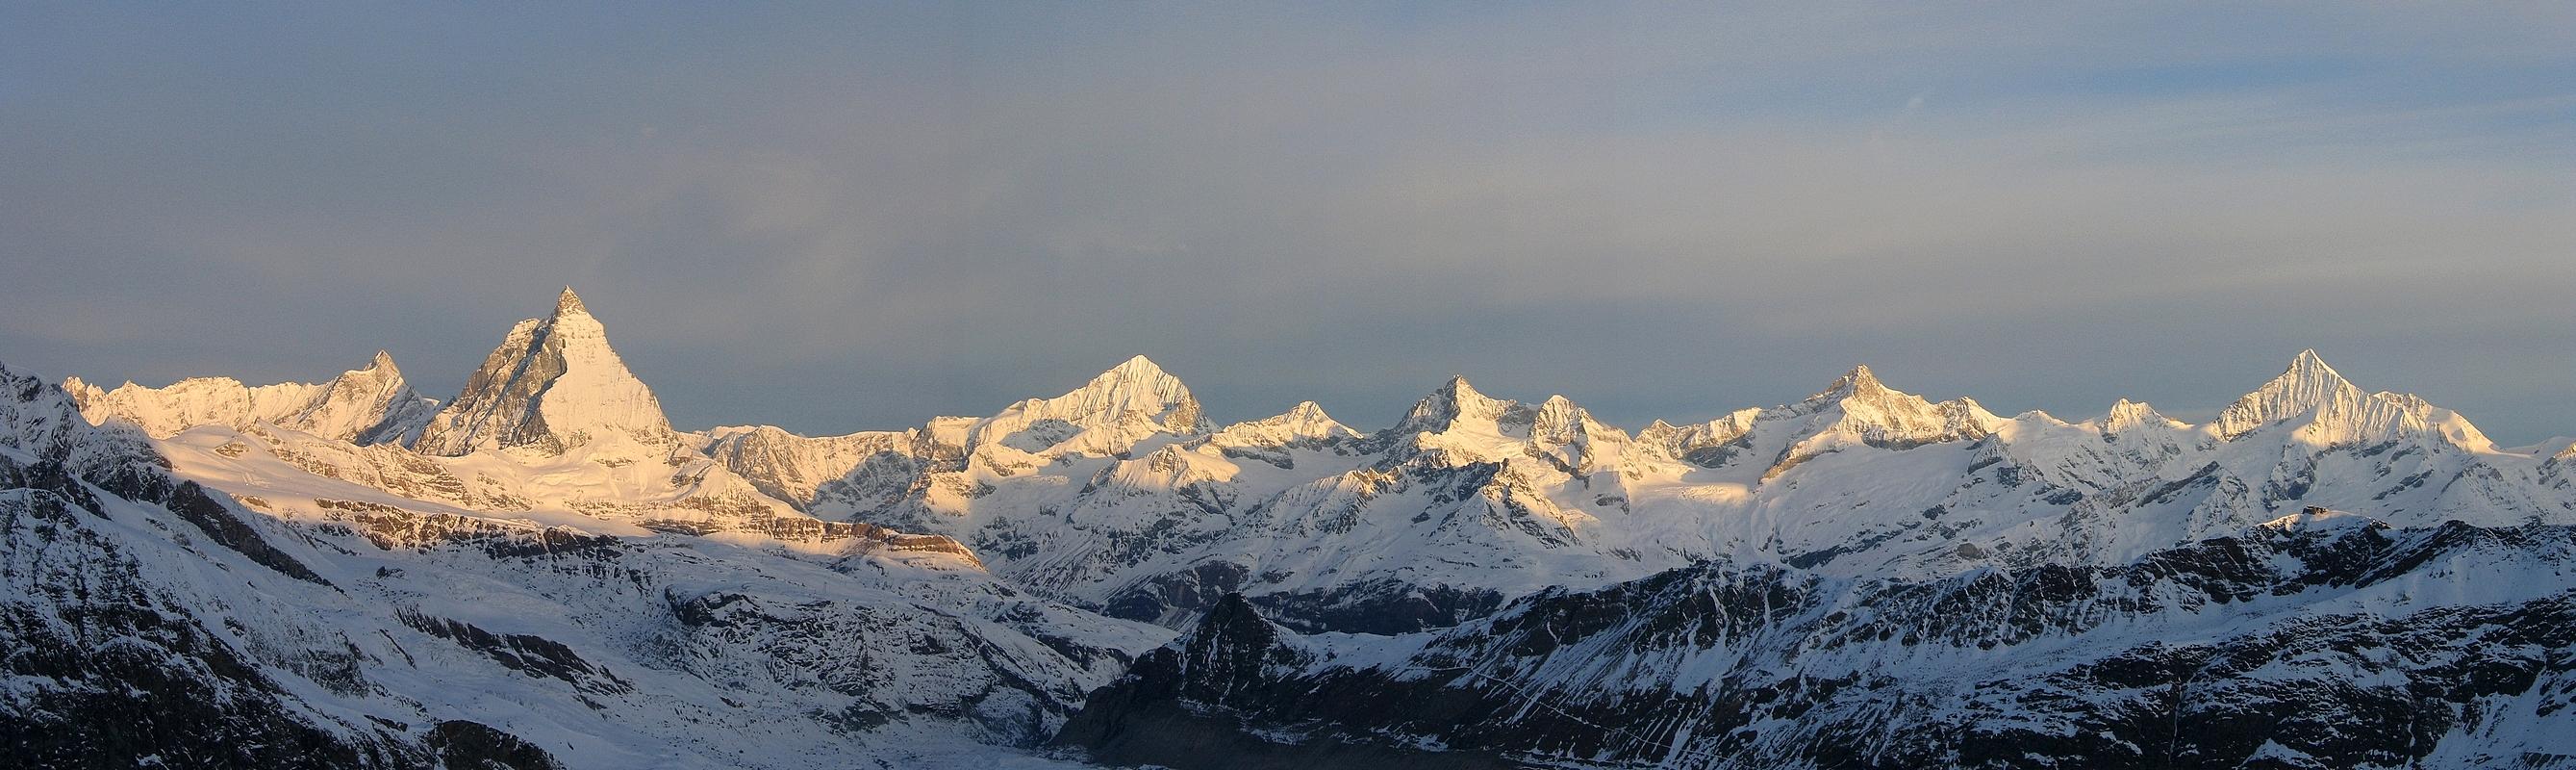 Dufourspitze / Punta Dufour - Monte Rosa Walliser Alpen / Alpes valaisannes Švýcarsko panorama 27